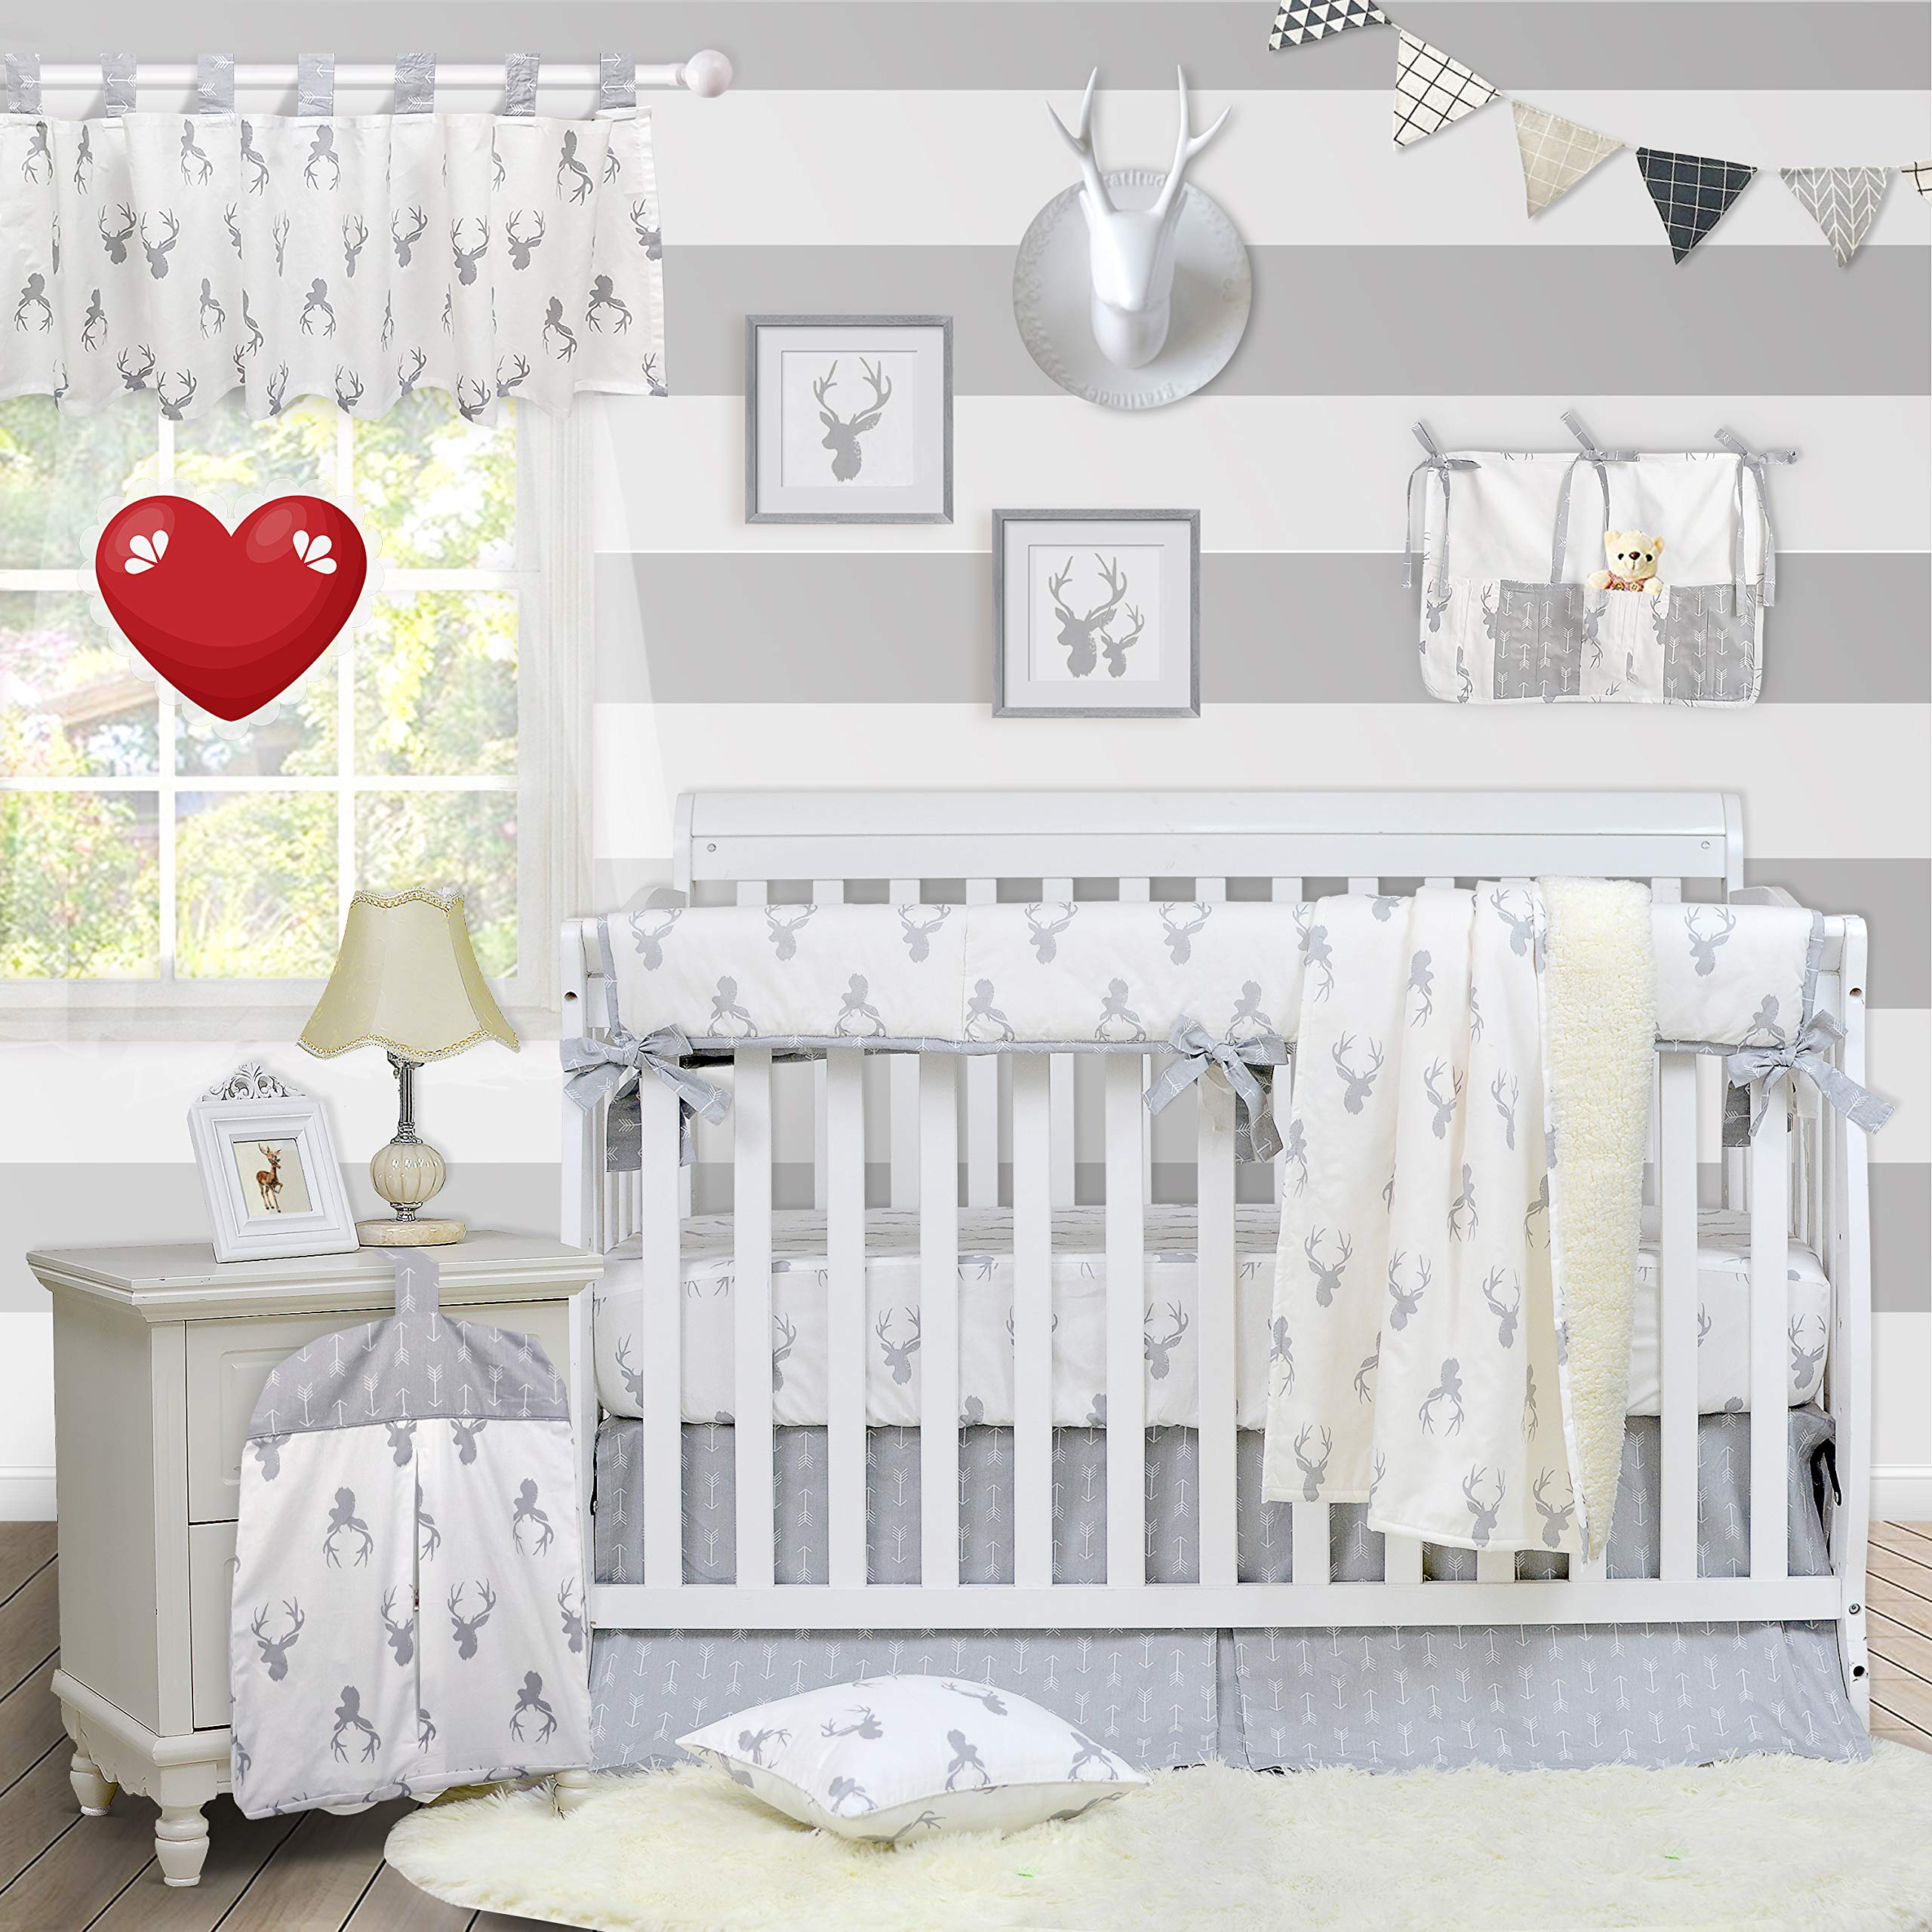 Brandream Crib Bedding Sets Neutral Baby Boy Girl Nursery Crib Bedding Woodland Arrow Deer Head Pattern White Gray Grey (9 Pieces Crib Bedding Set with Crib Rail Cover) by Brandream